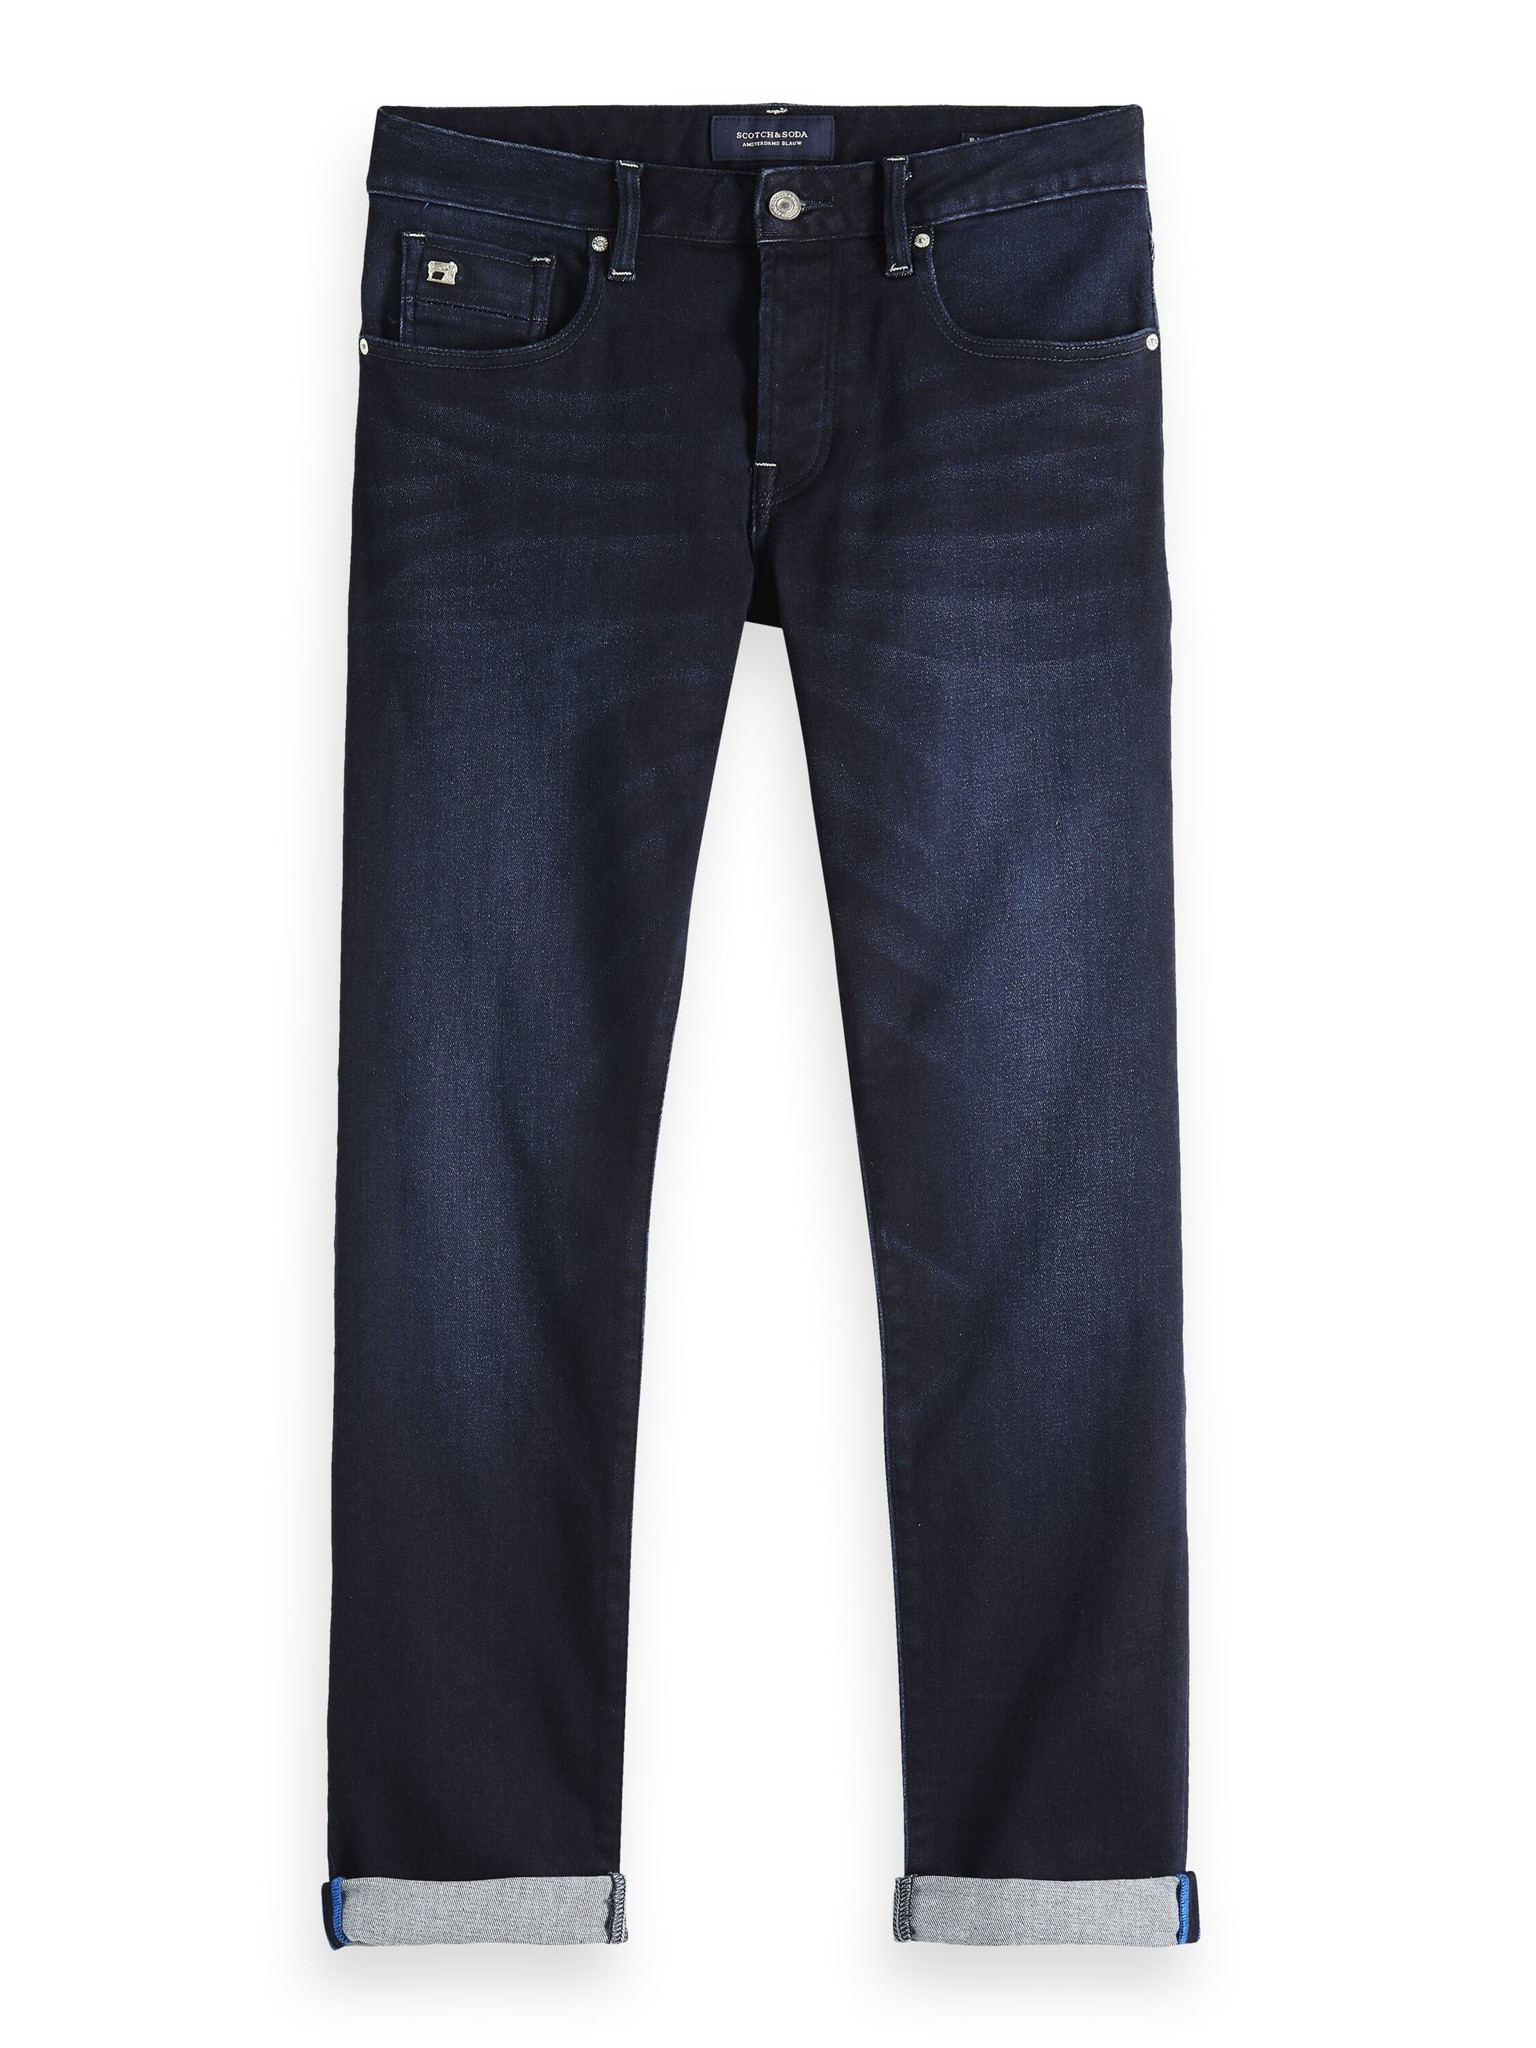 Scotch & Soda Ralston Freerunner Blue Jeans | 150959